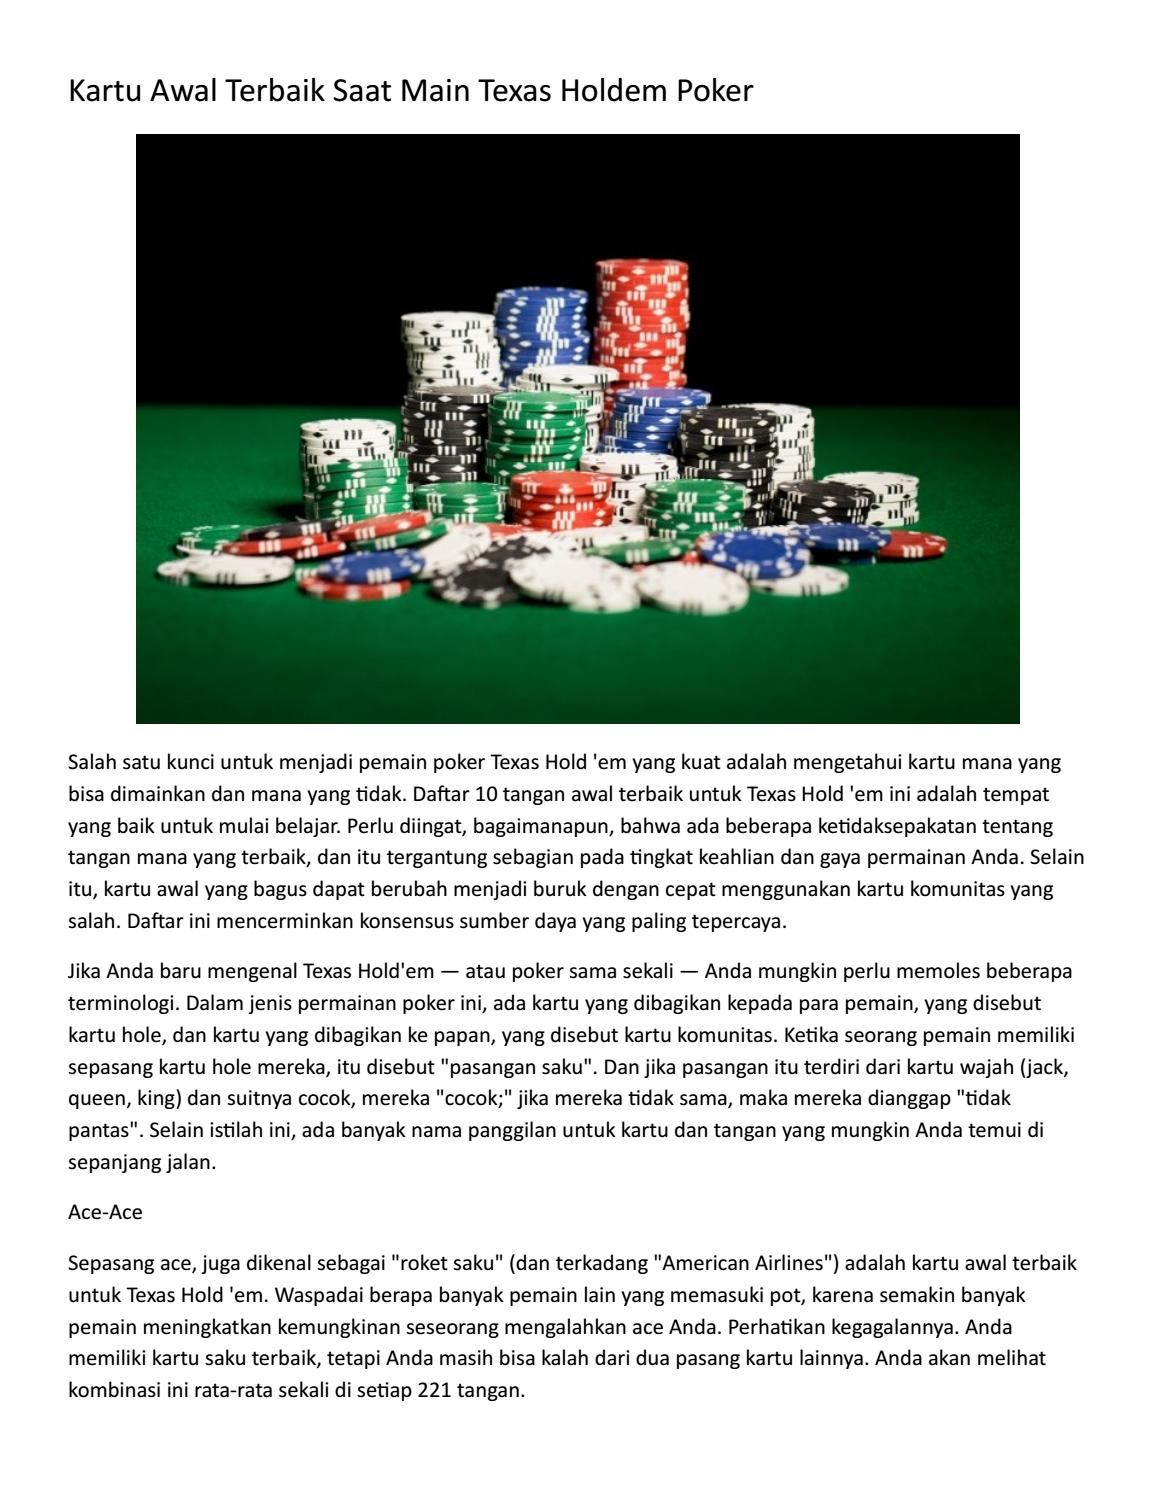 Kartu Awal Terbaik Saat Main Texas Holdem Poker By Pokerterus Issuu